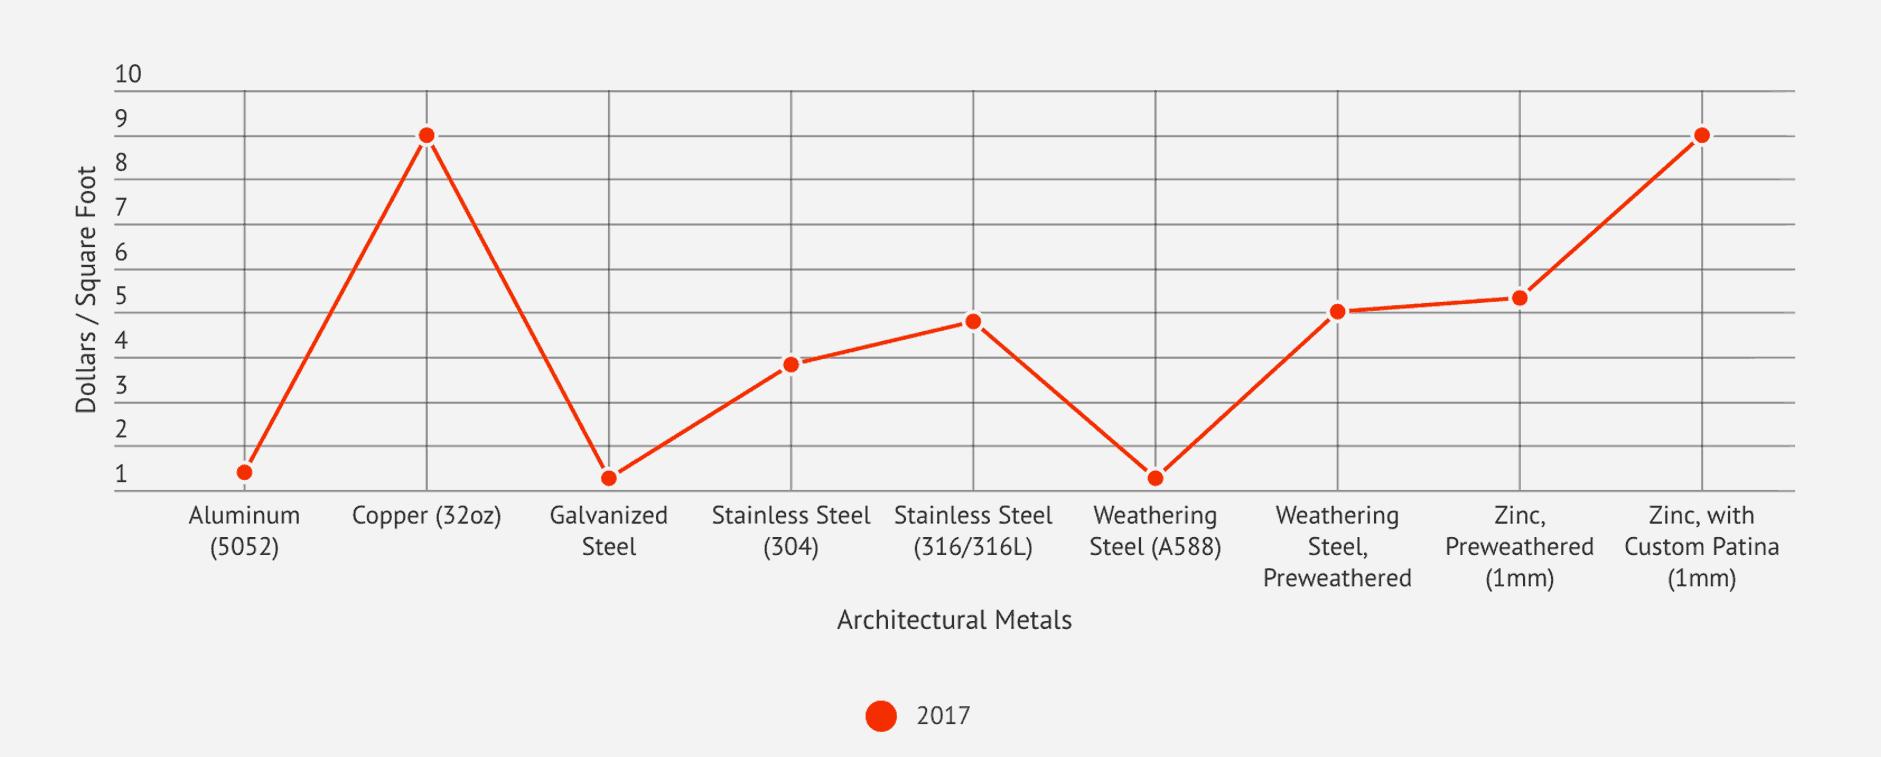 Relative price comparison chart for architectural metals, 2017.